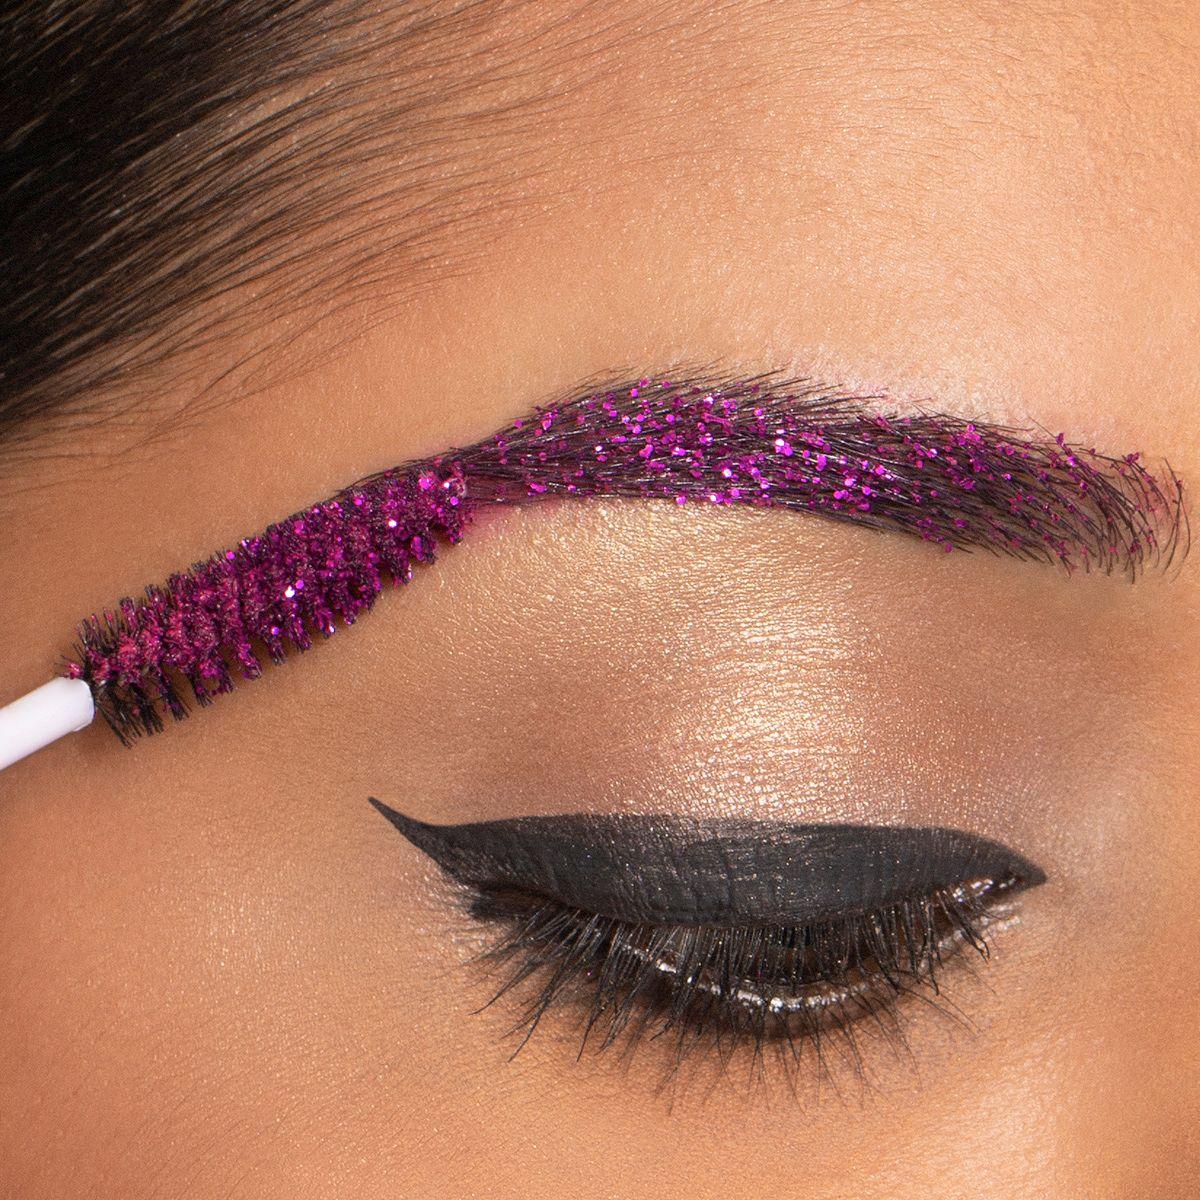 Glitter Eyebrow Makeup Look